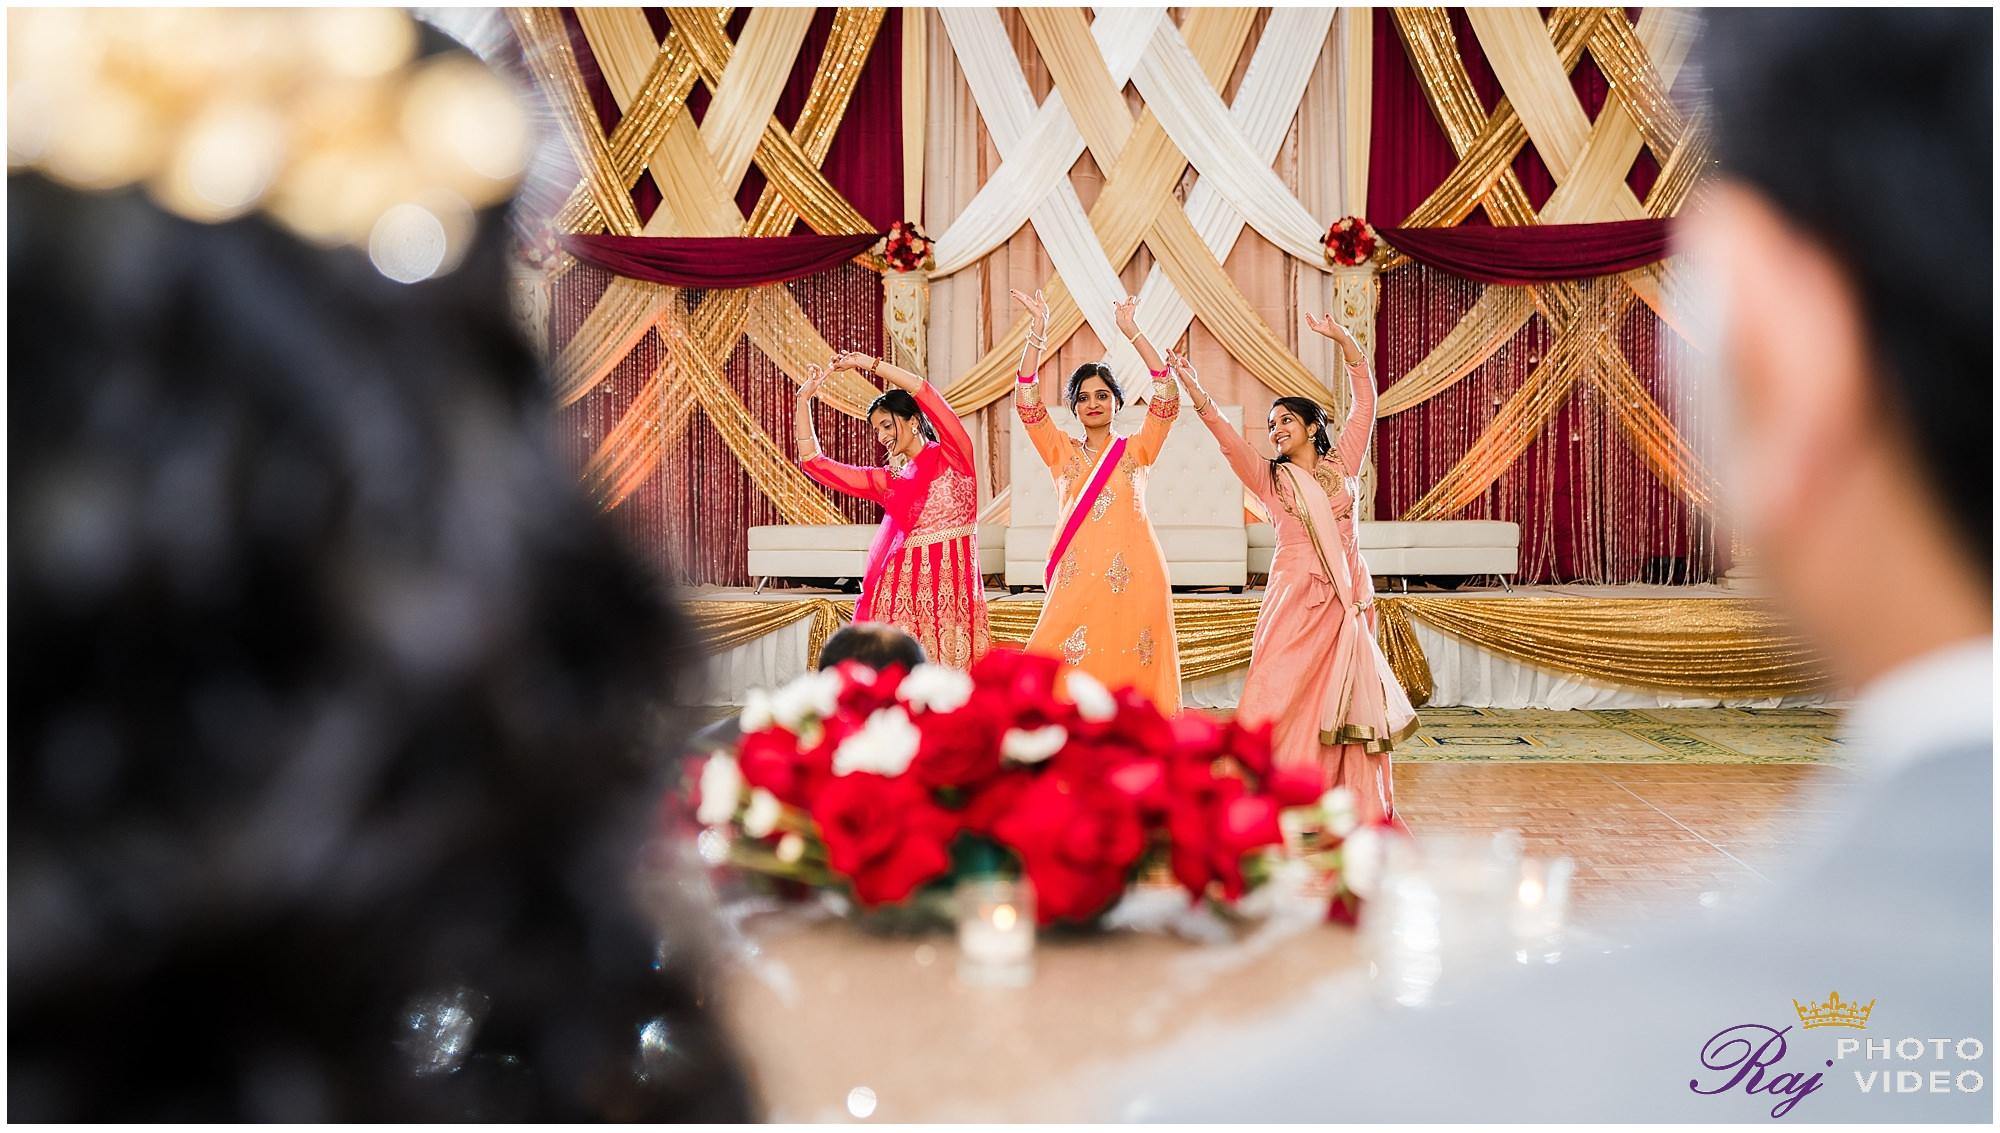 Founders-Inn-and-Spa-Virginia-Beach-VA-Indian-Wedding-Harini-Vivek-79.jpg